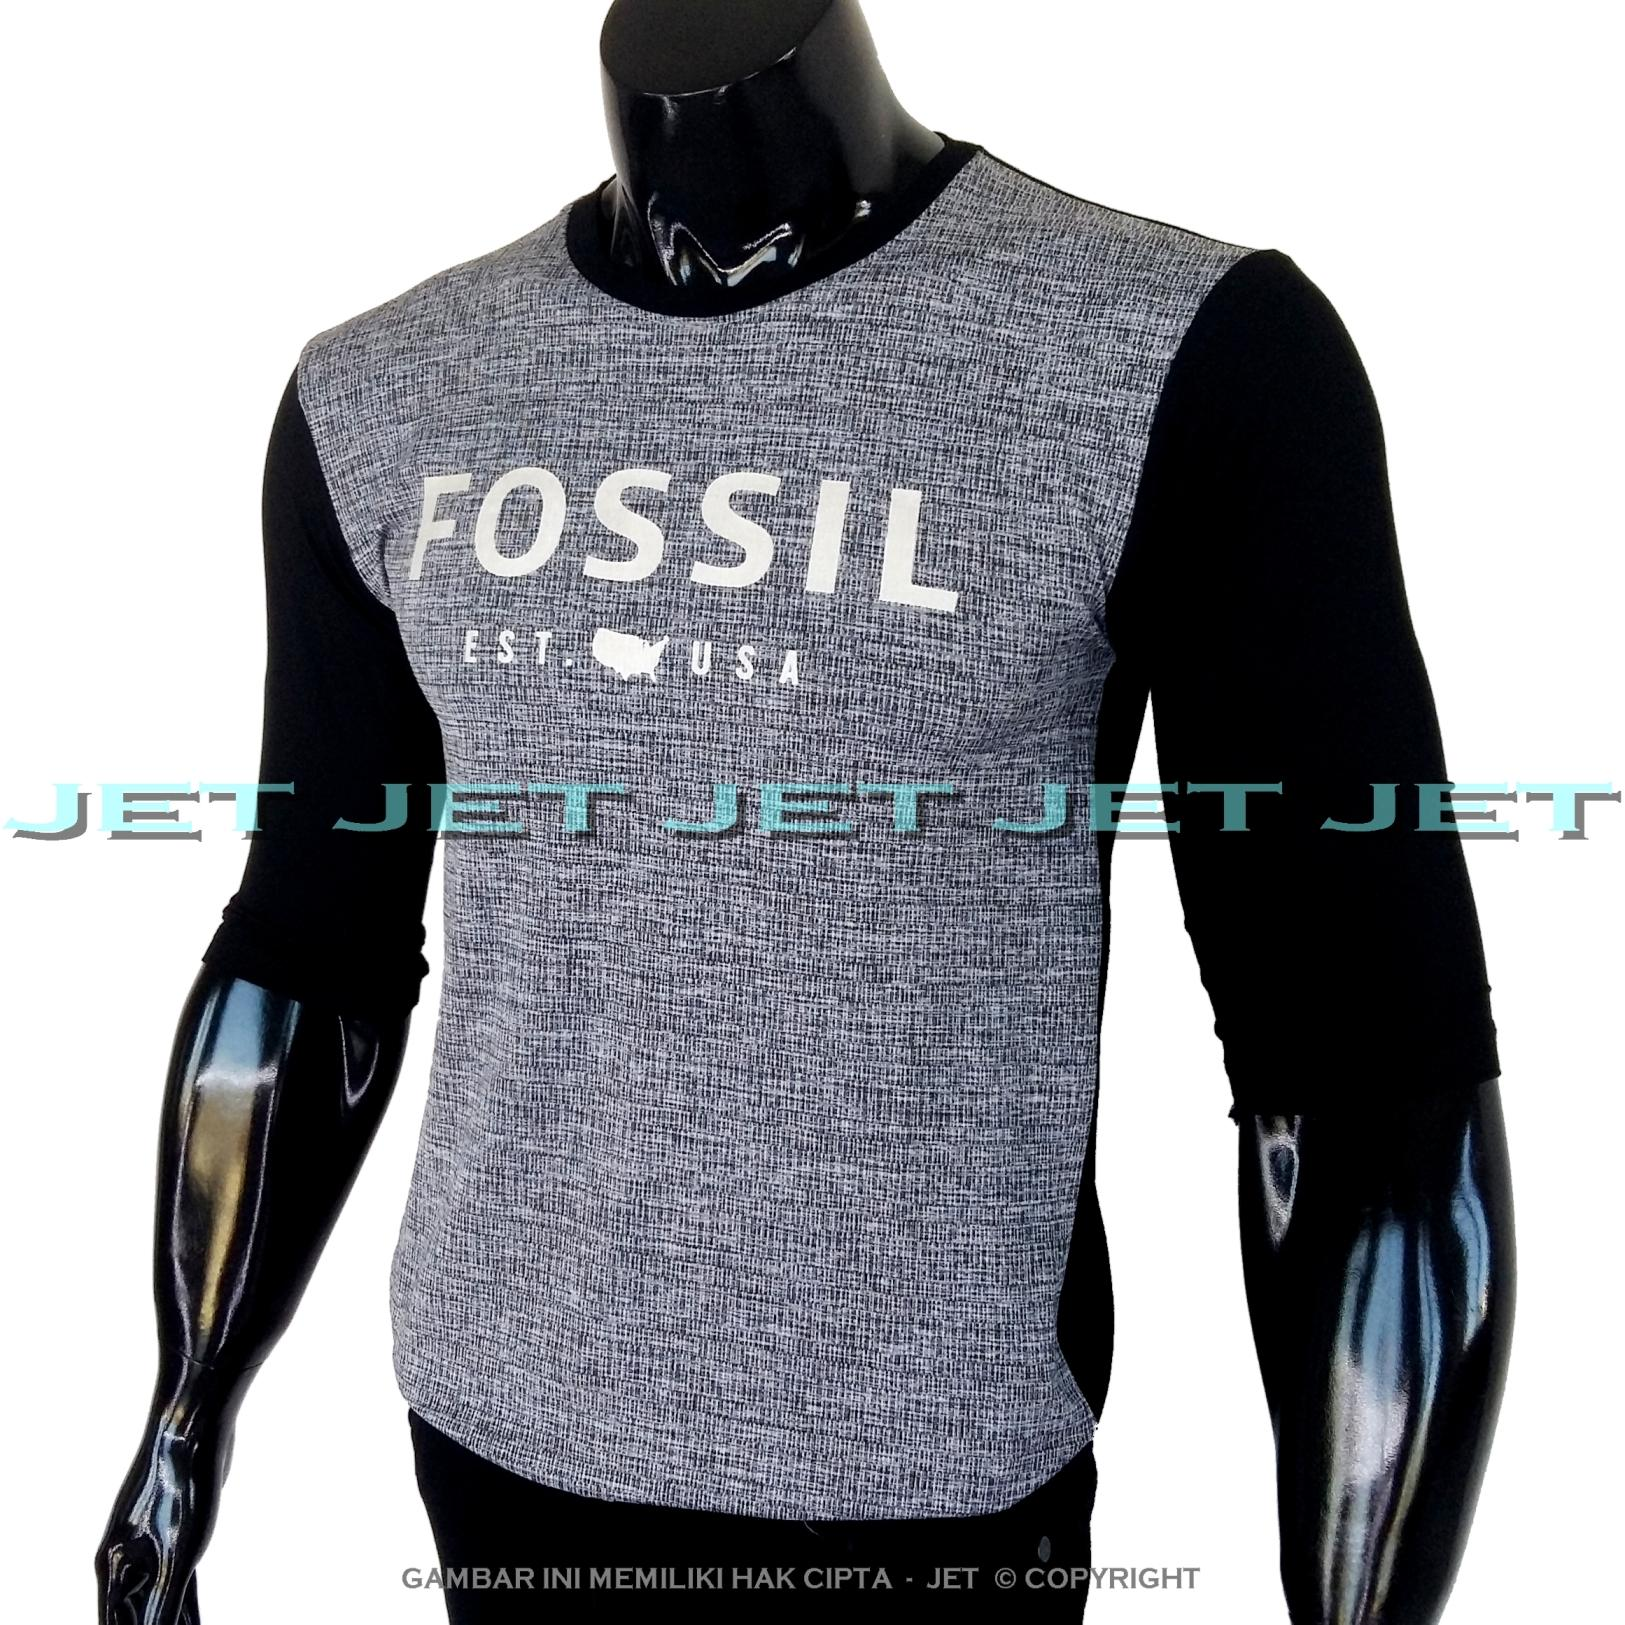 JET - Kaos Distro FOSSIL Lengan 3/4 Panjang Soft Rayon Viscose Blended Lycra Size M Fit To L Pria / Wanita Garis Salur Motif Visual Art